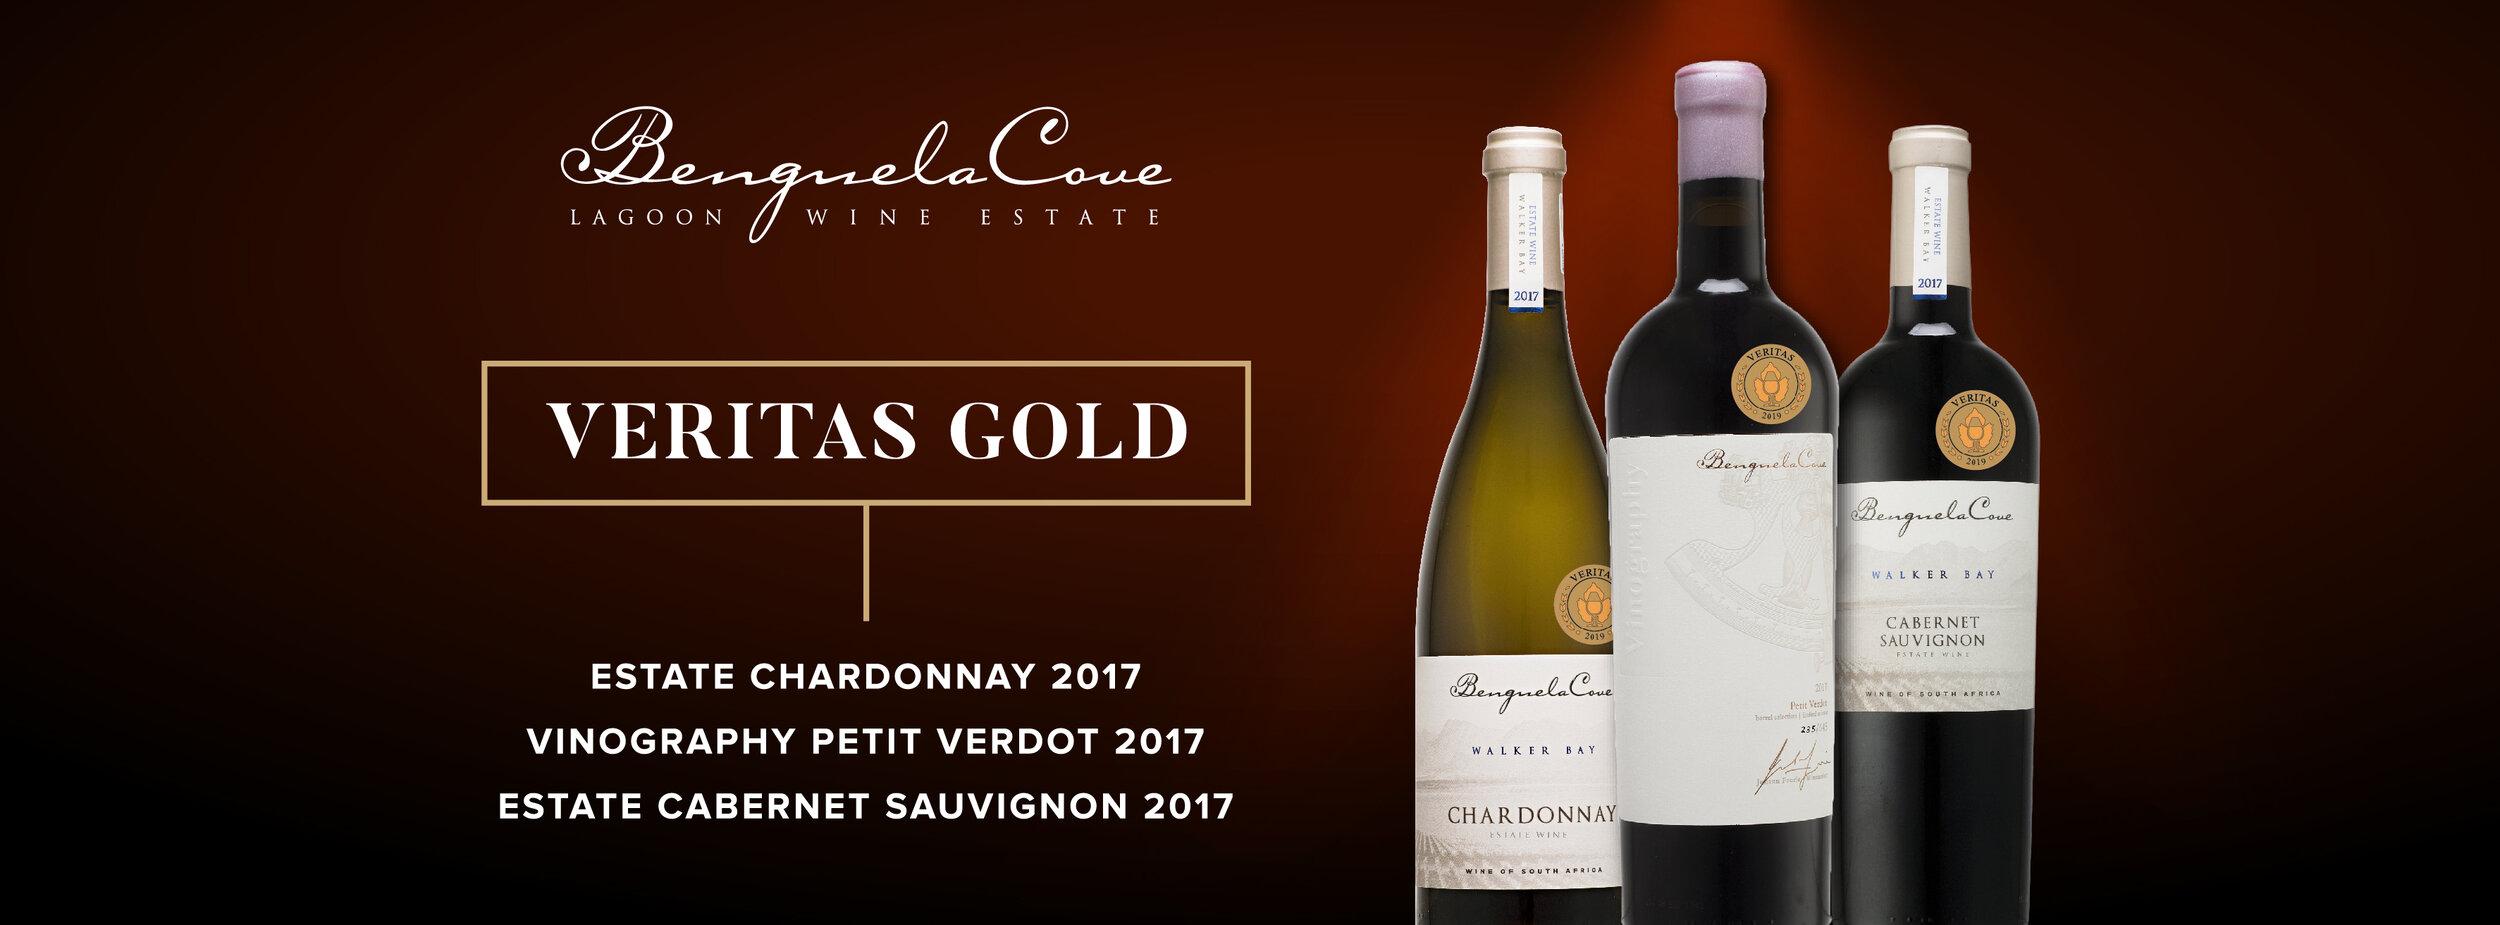 Benguela wins 3 Gold in Veritas Awards.jpg